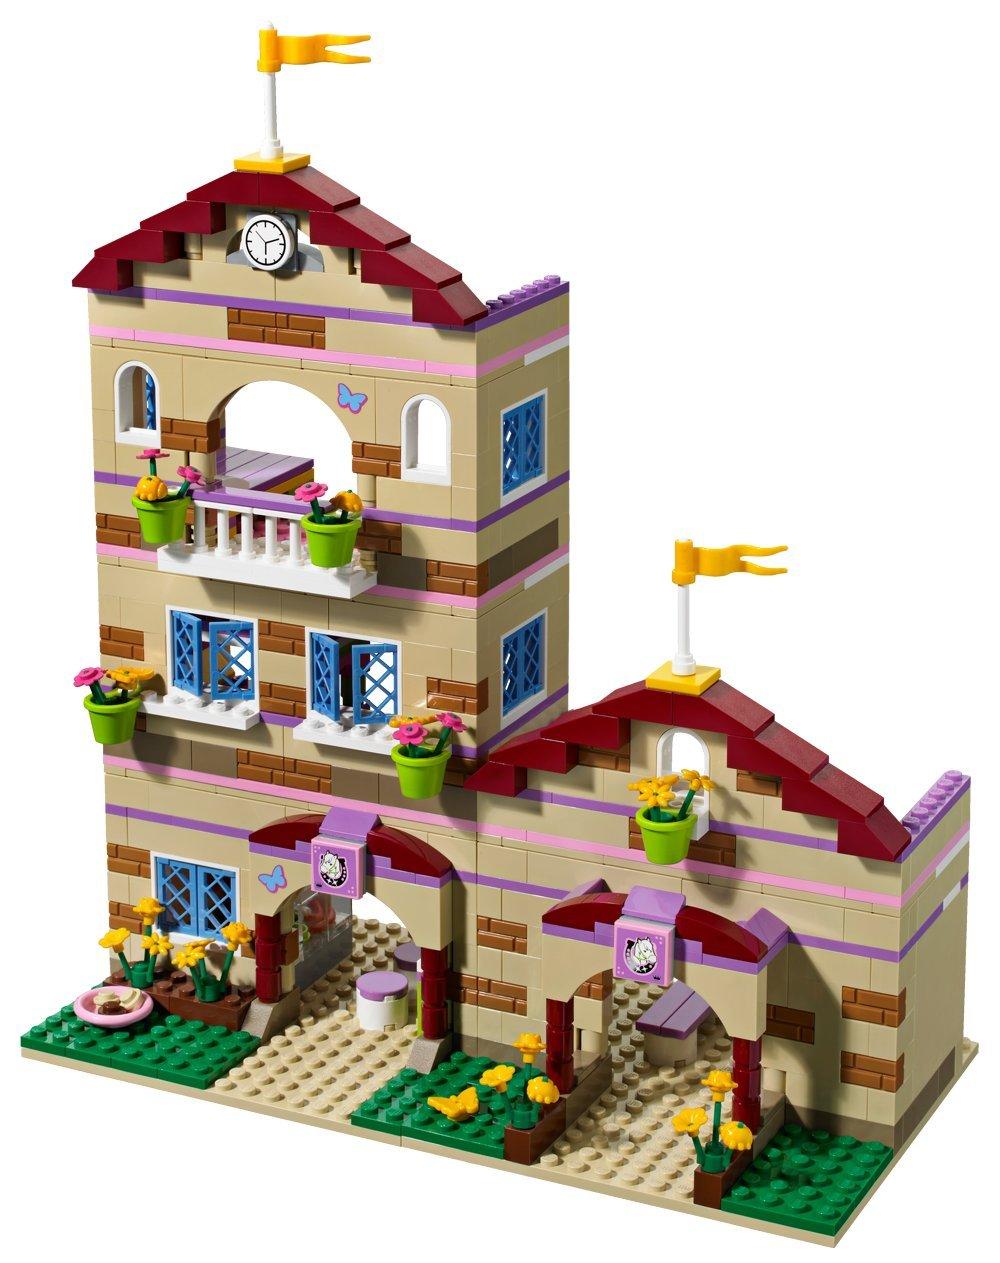 Lego friends heartlake grand hotel 41101 lego friends uk - Lego Friends Heartlake Grand Hotel 41101 Lego Friends Uk 21